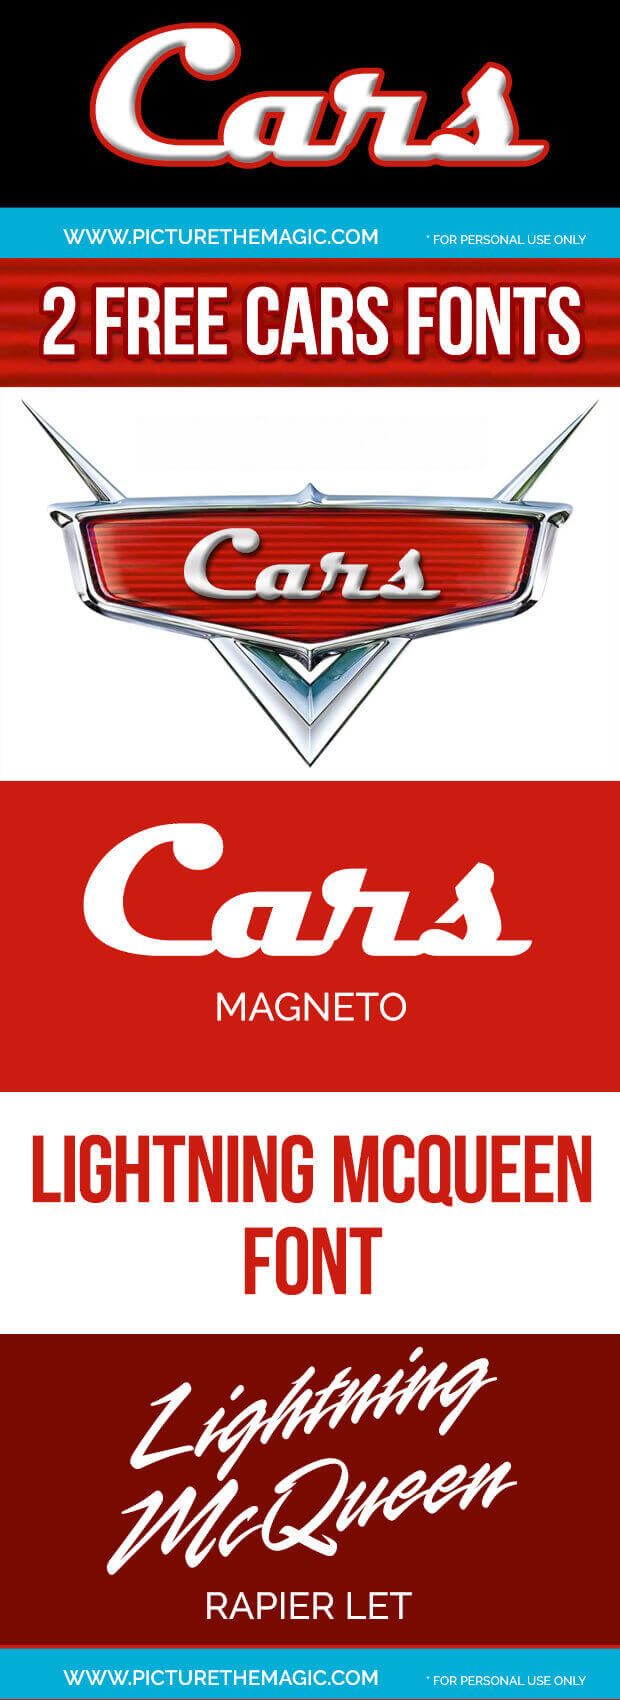 disney cars font | Bestmotor co